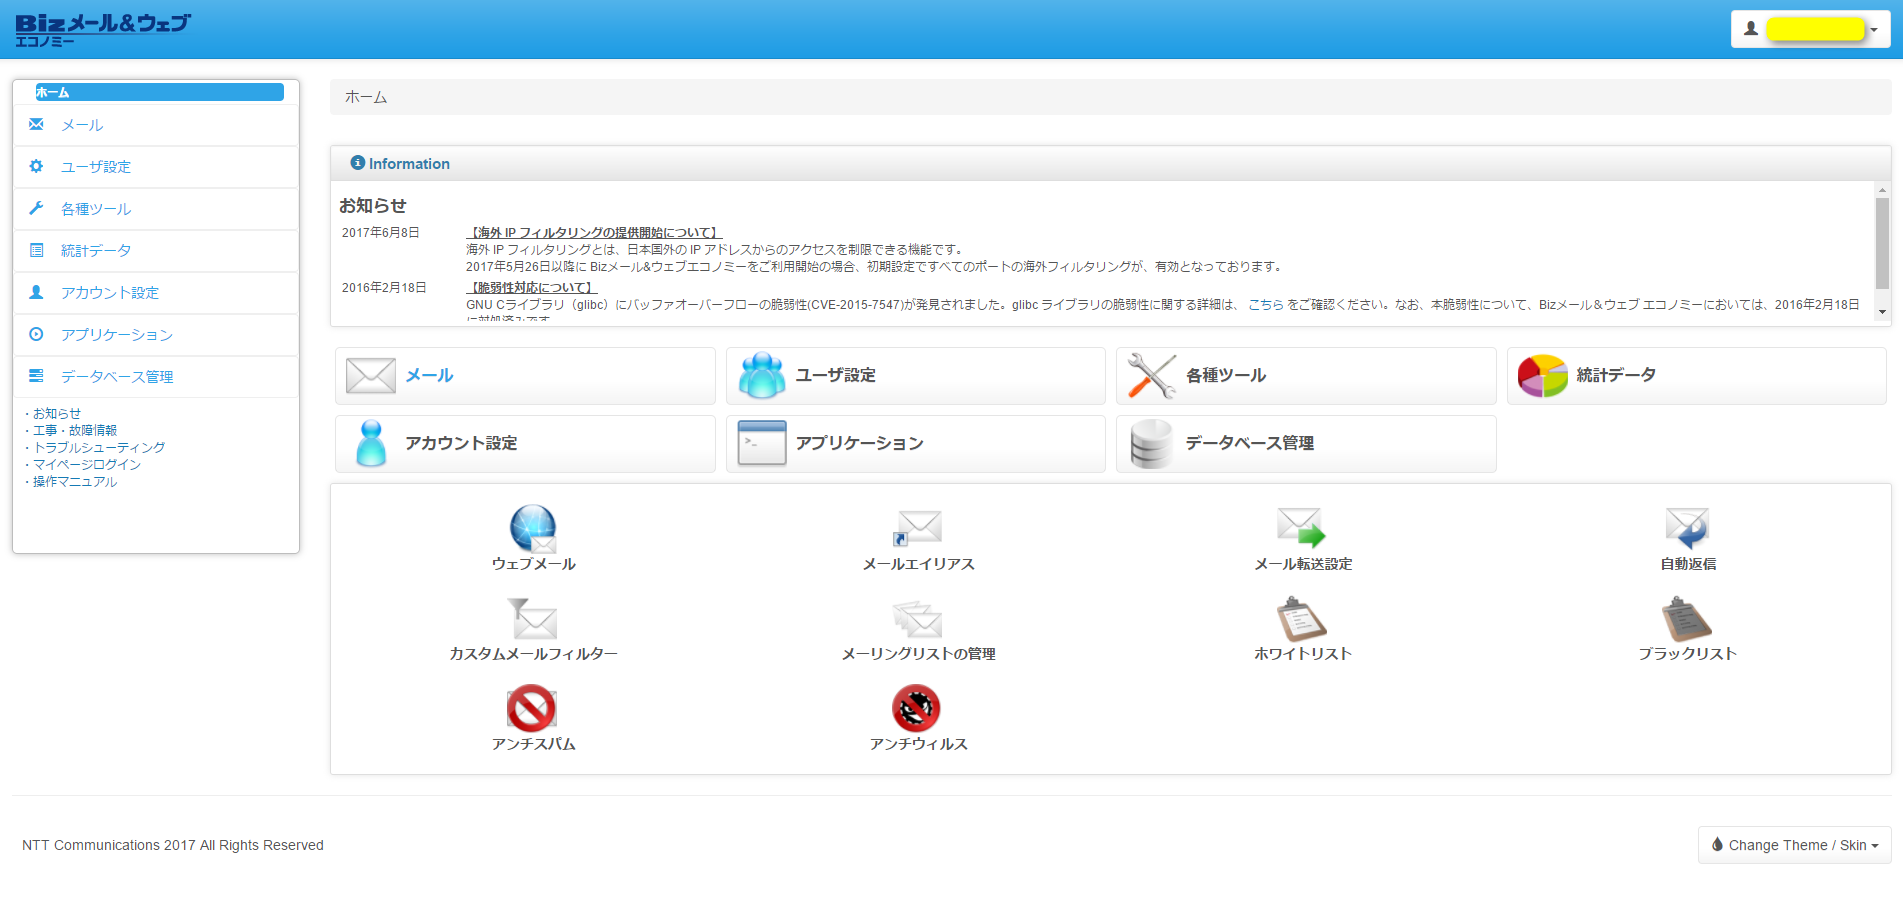 NTT BizLinkのBizメール&ウェブでWordpressをインストールしトップに表示する方法